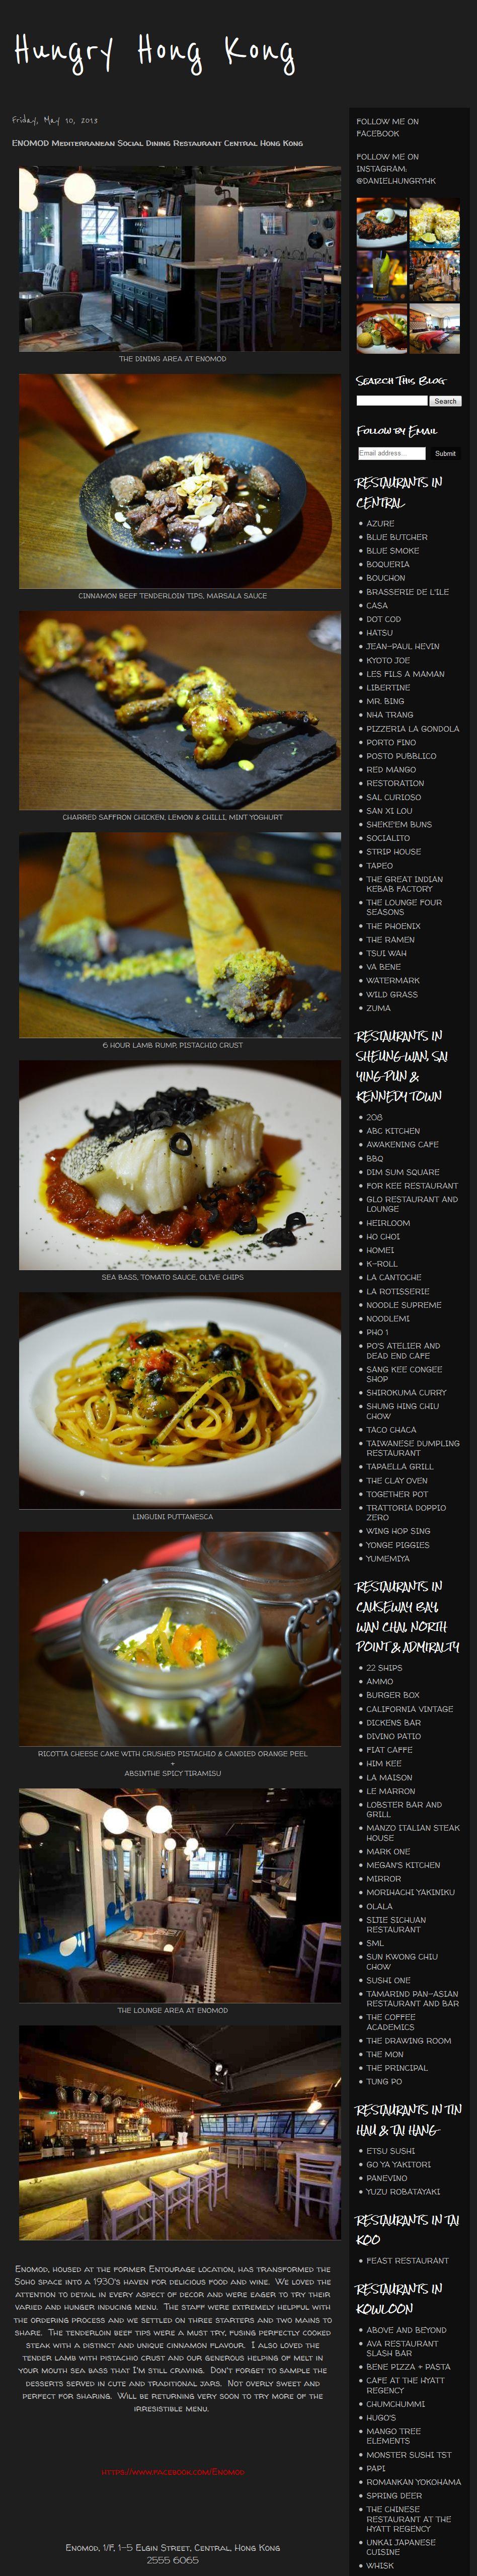 ENOMOD - 10.05 - Hungry HK Blog (online).jpg